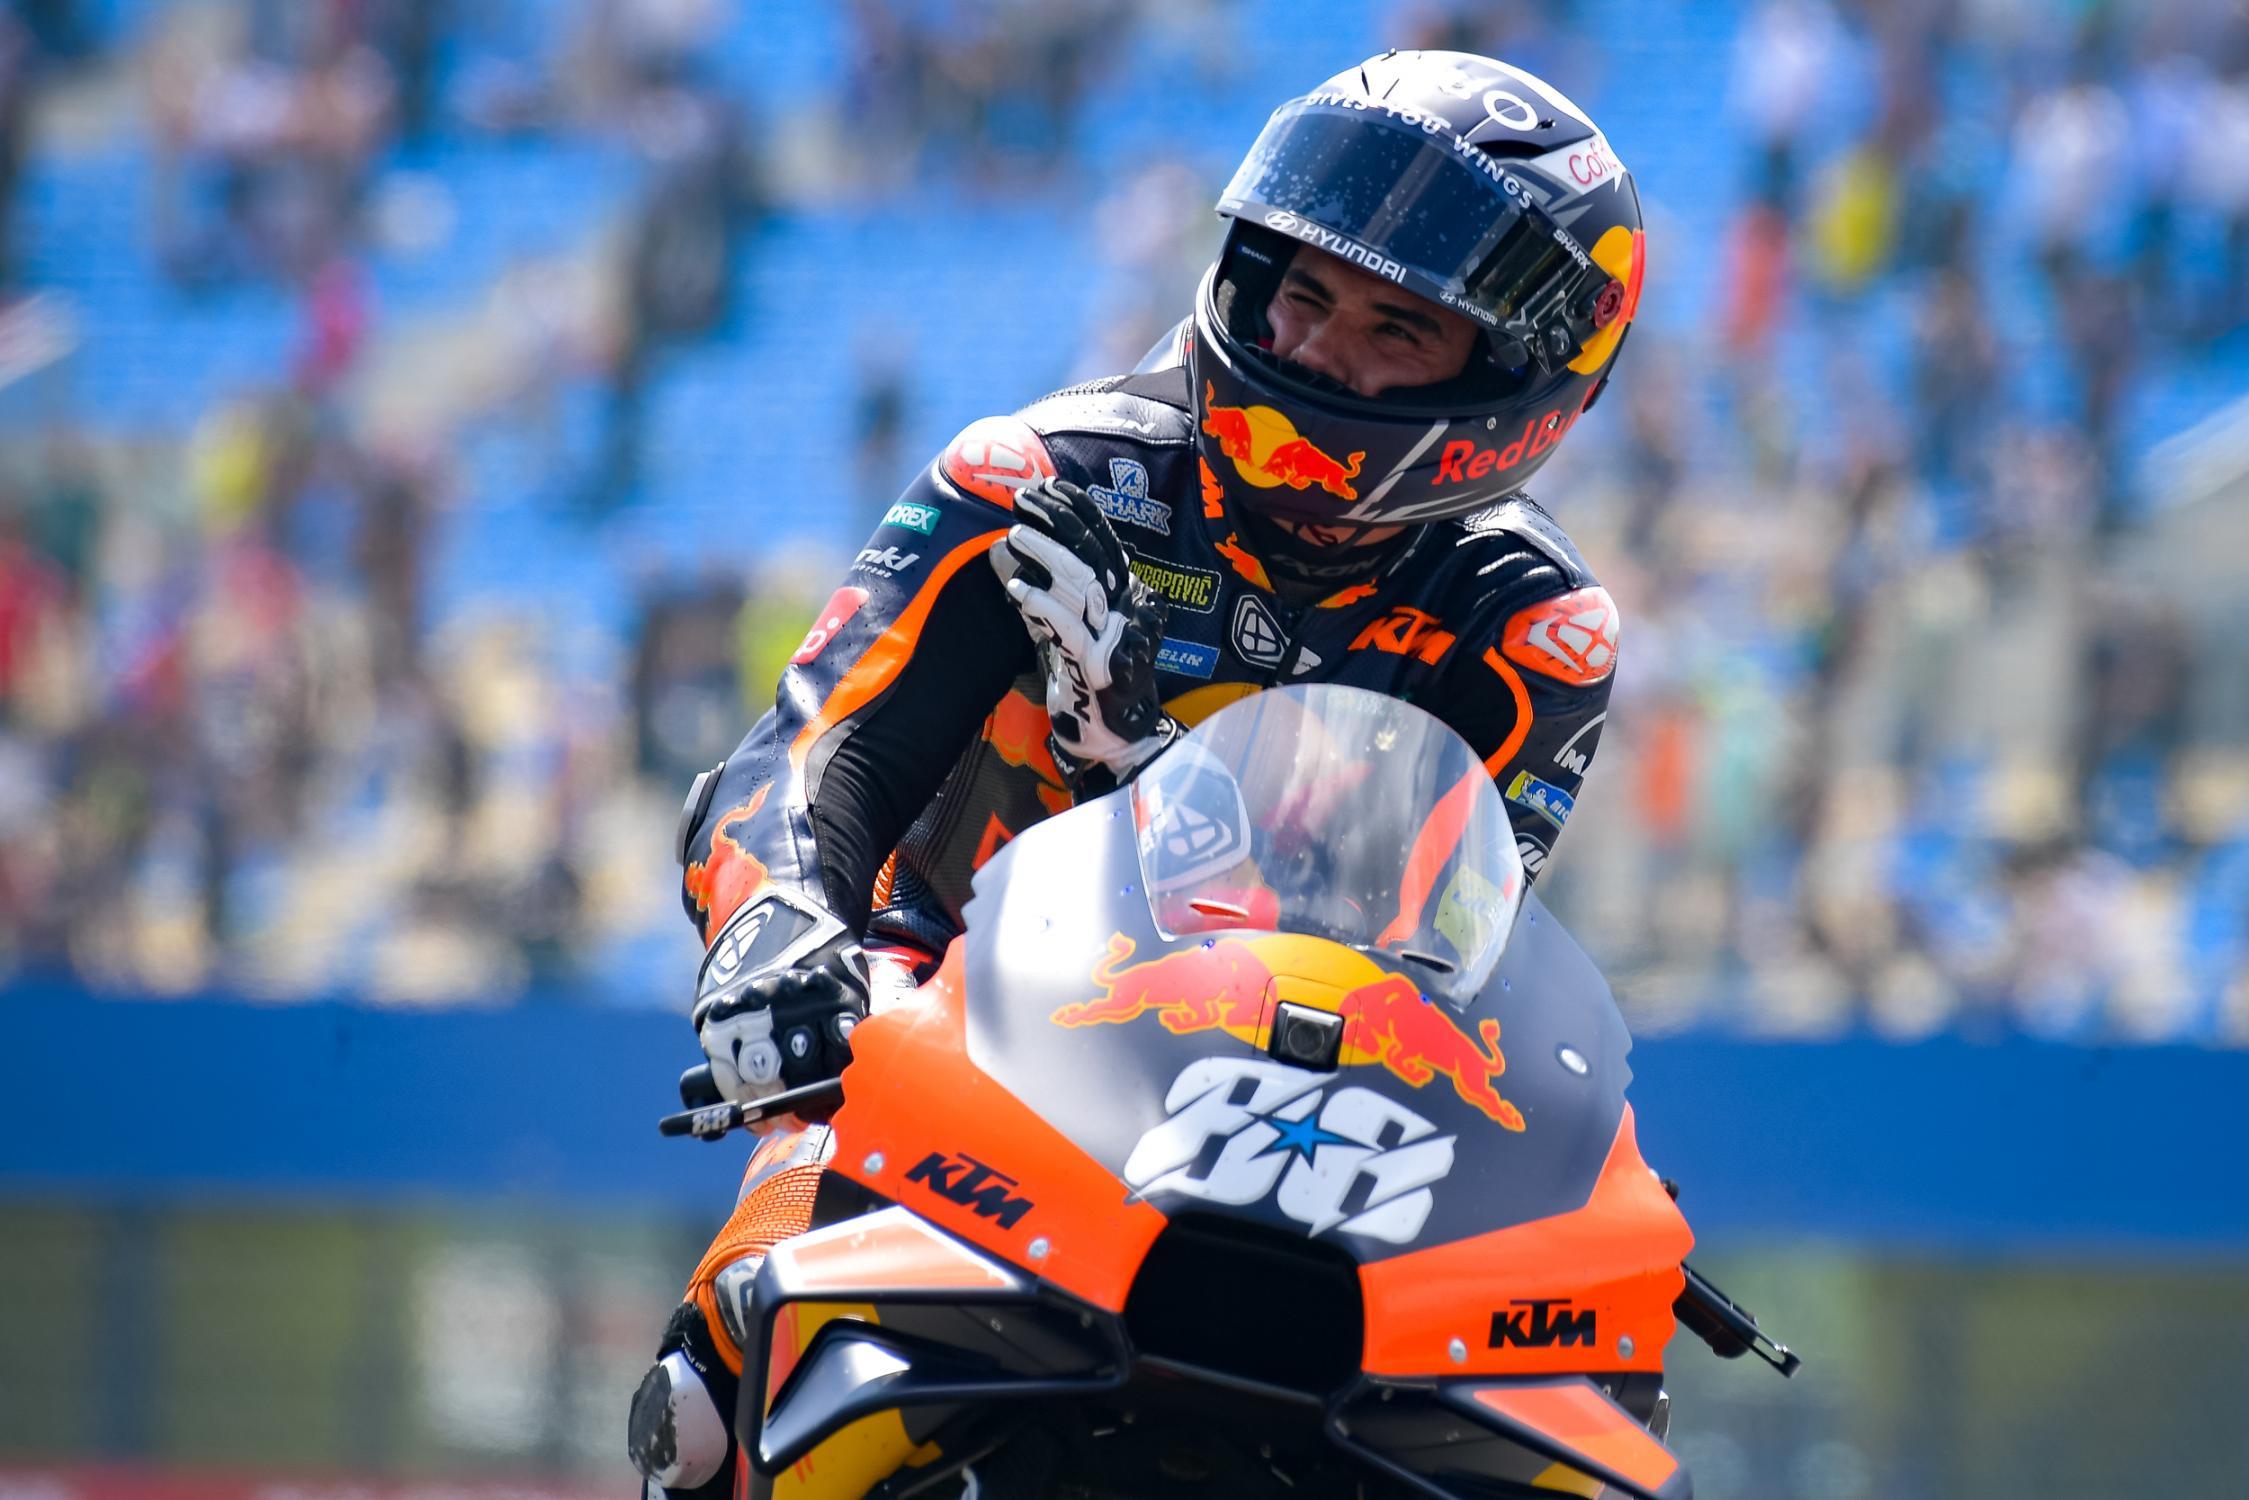 Miguel Oliveira KTM, MotoGP